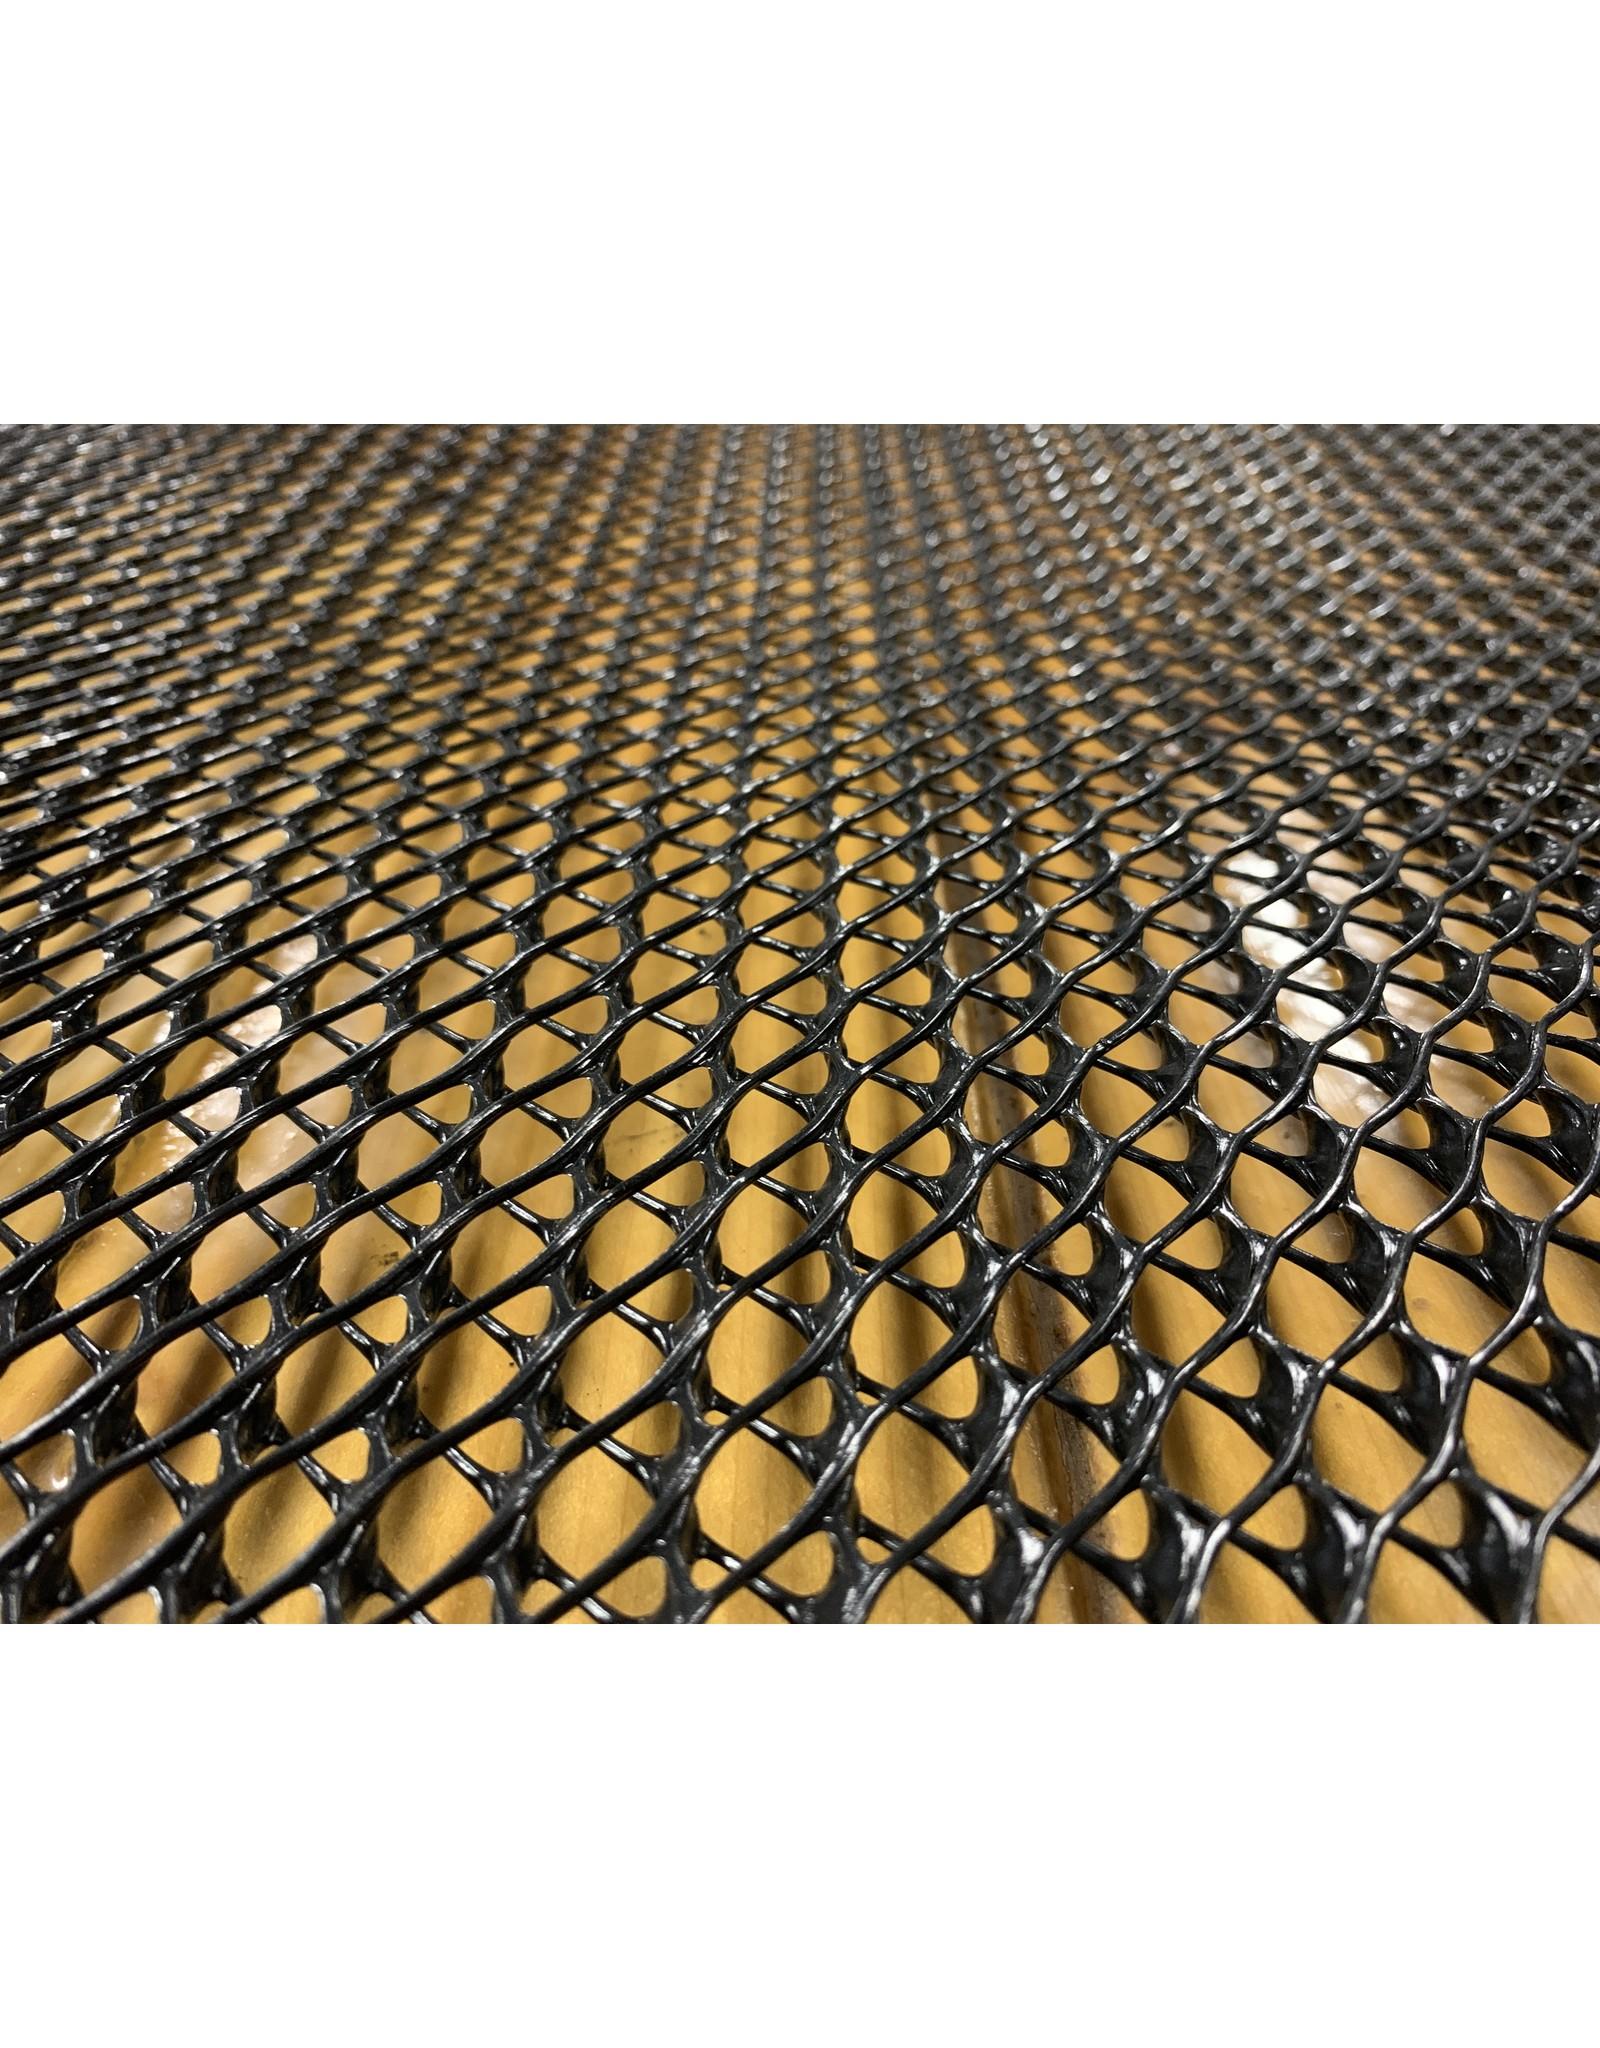 KOALA CREEK 3d Mesh Matratzenunterlage für Dachzelt